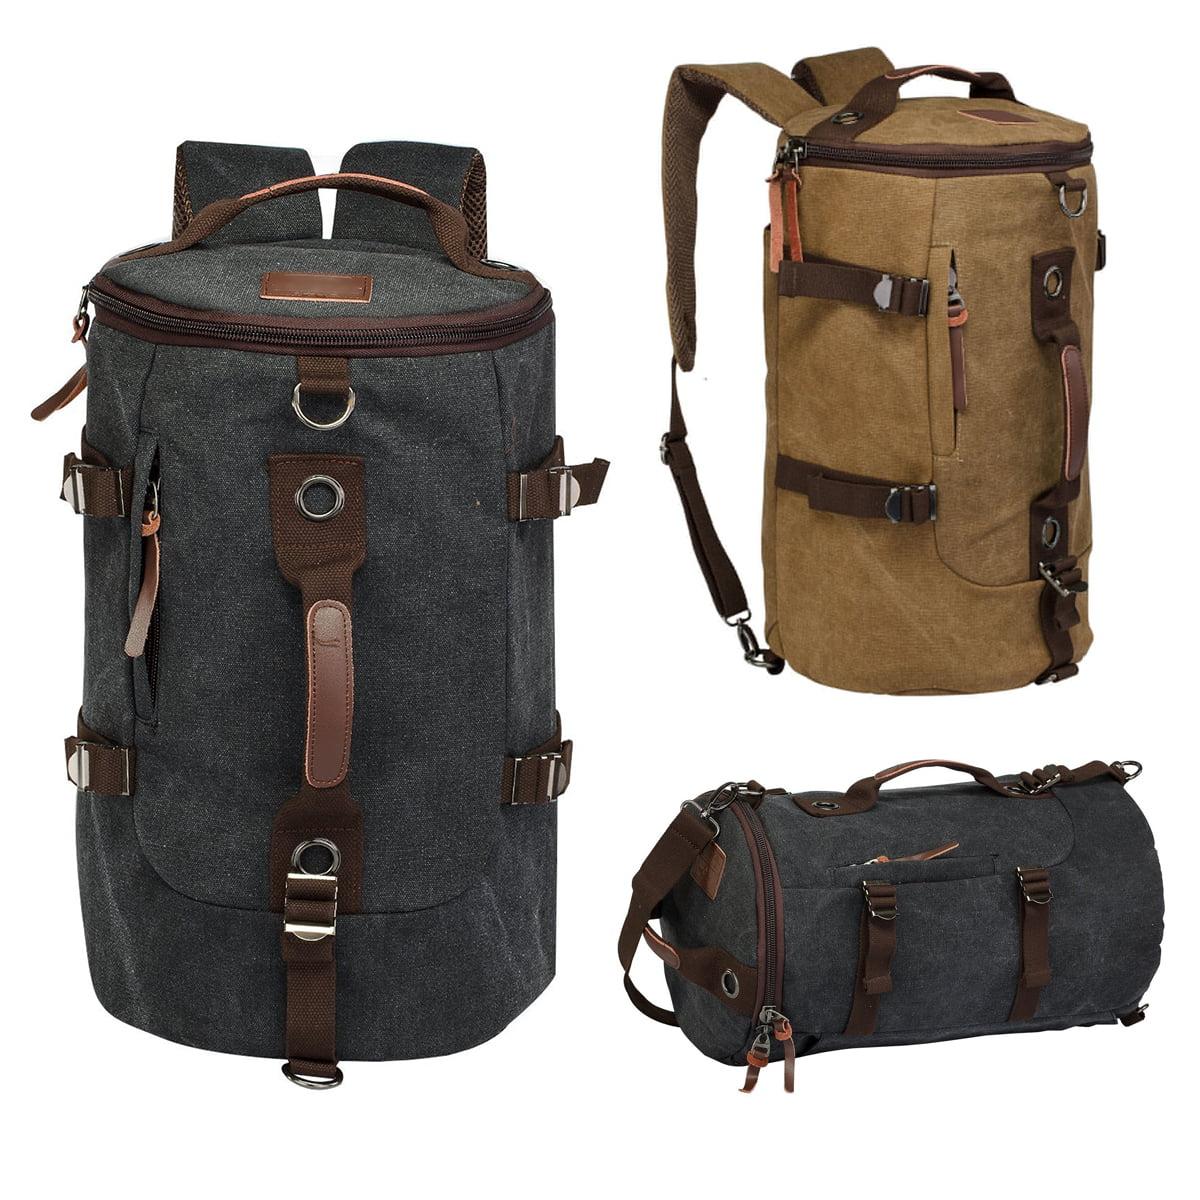 092232997d LUXUR Retro Duffel 30L Cylinder Bag Canvas Travel Backpack Hiking Shoulder  Handbag - Walmart.com